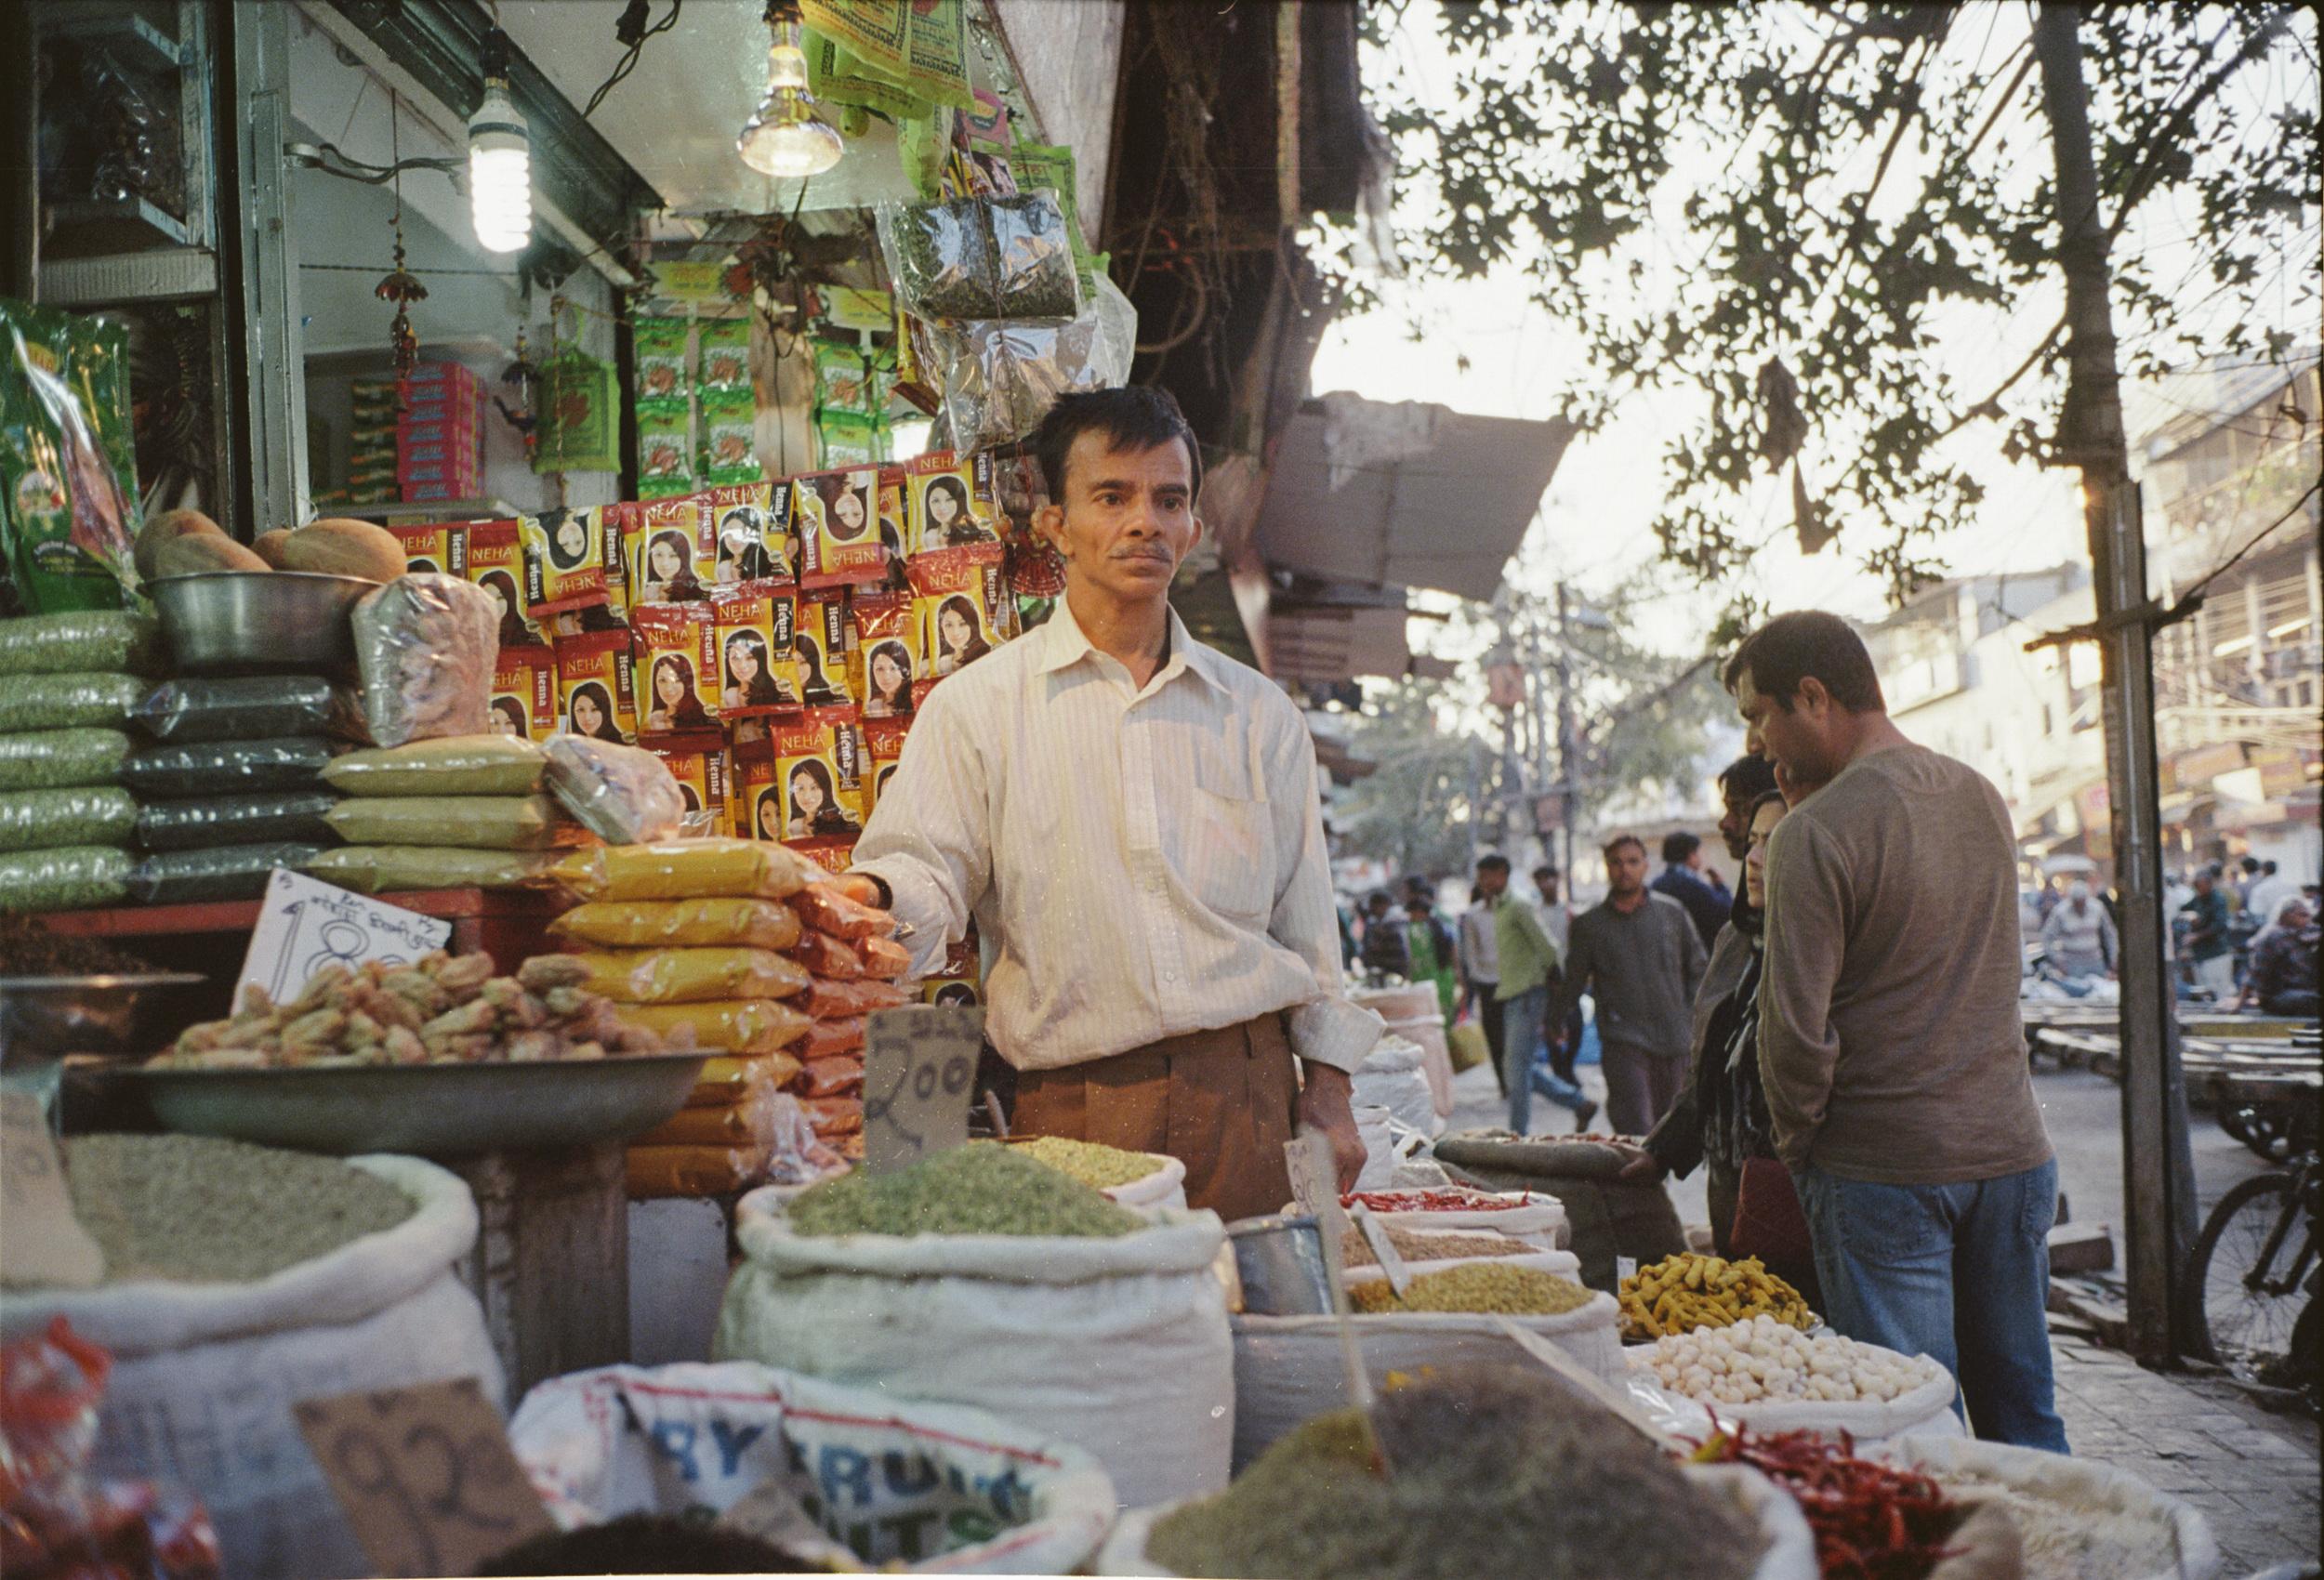 72-F21_Spice Market, Delhi, India 2016-12.jpg